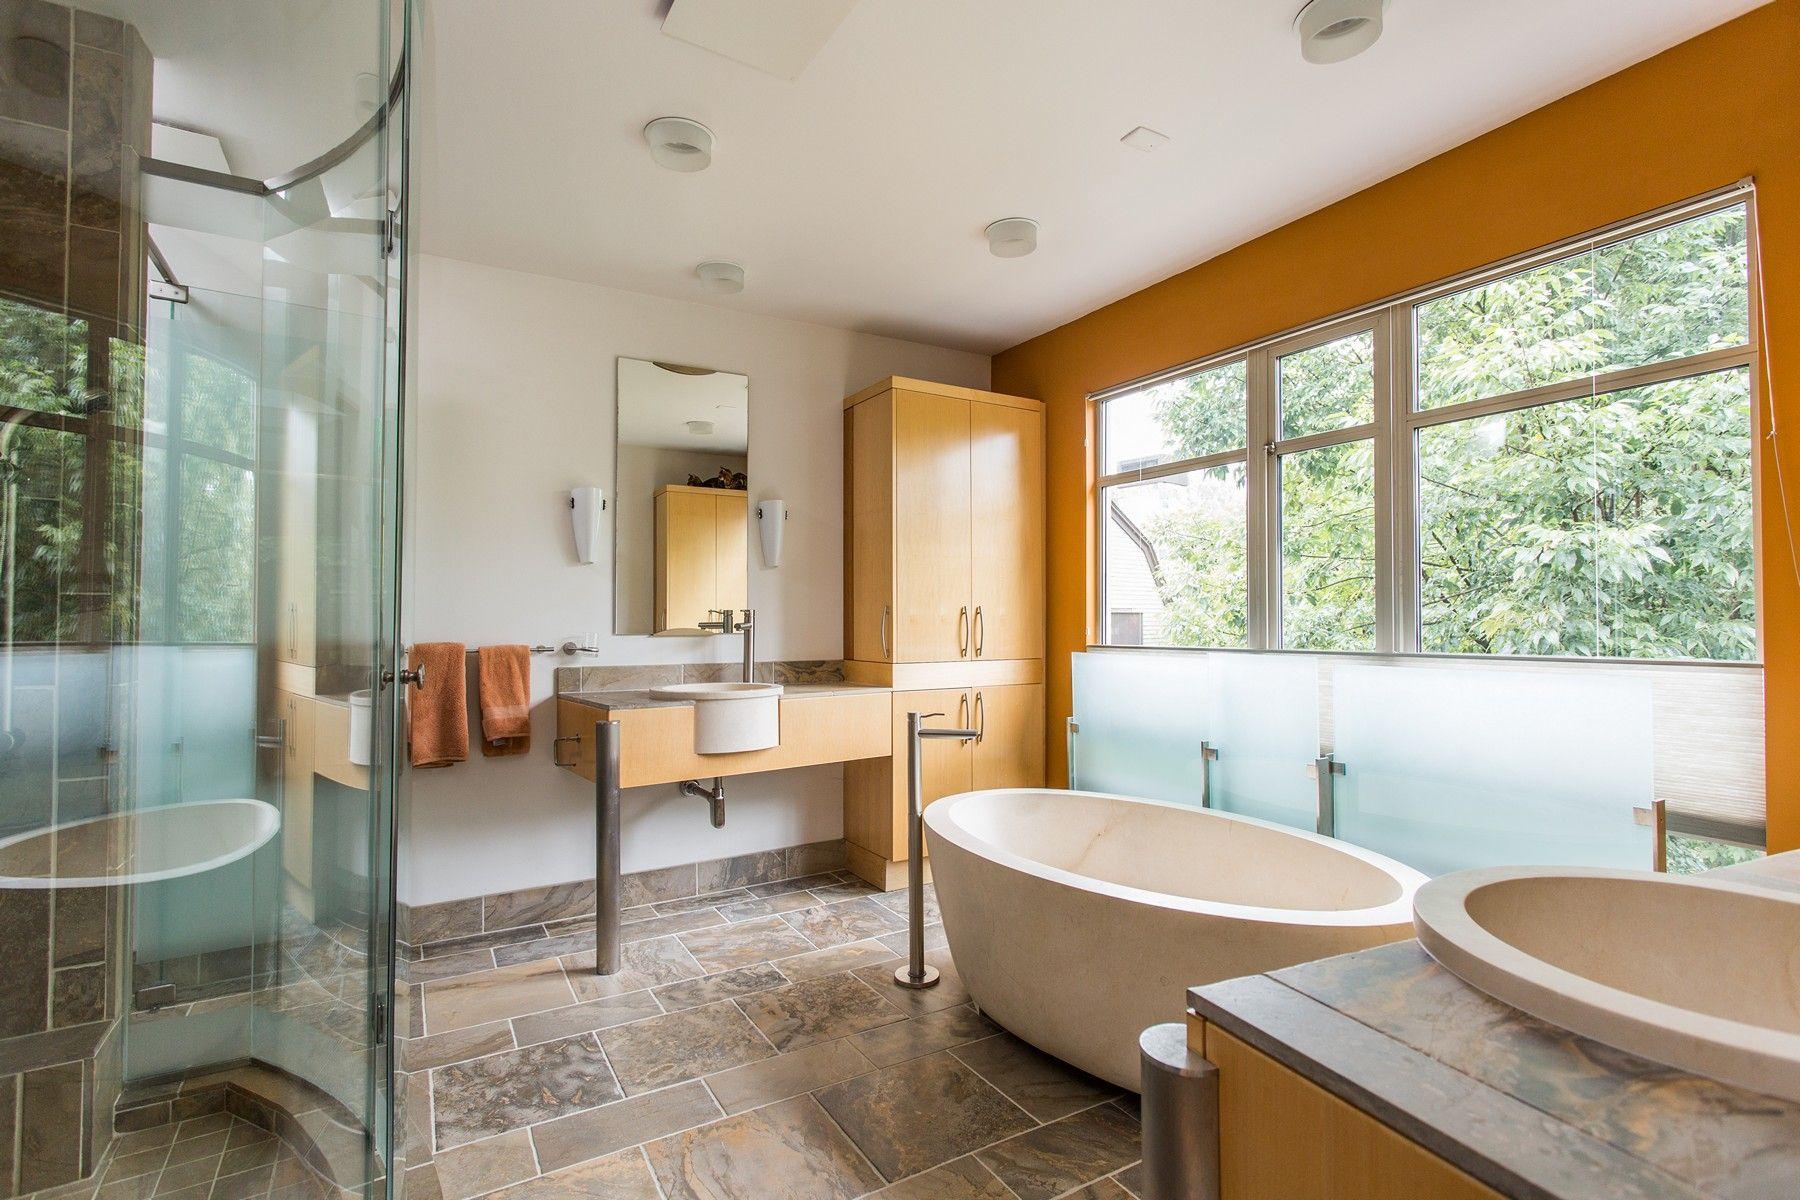 Pin by Encore   Sotheby's Internation on Luxury   Baths ...